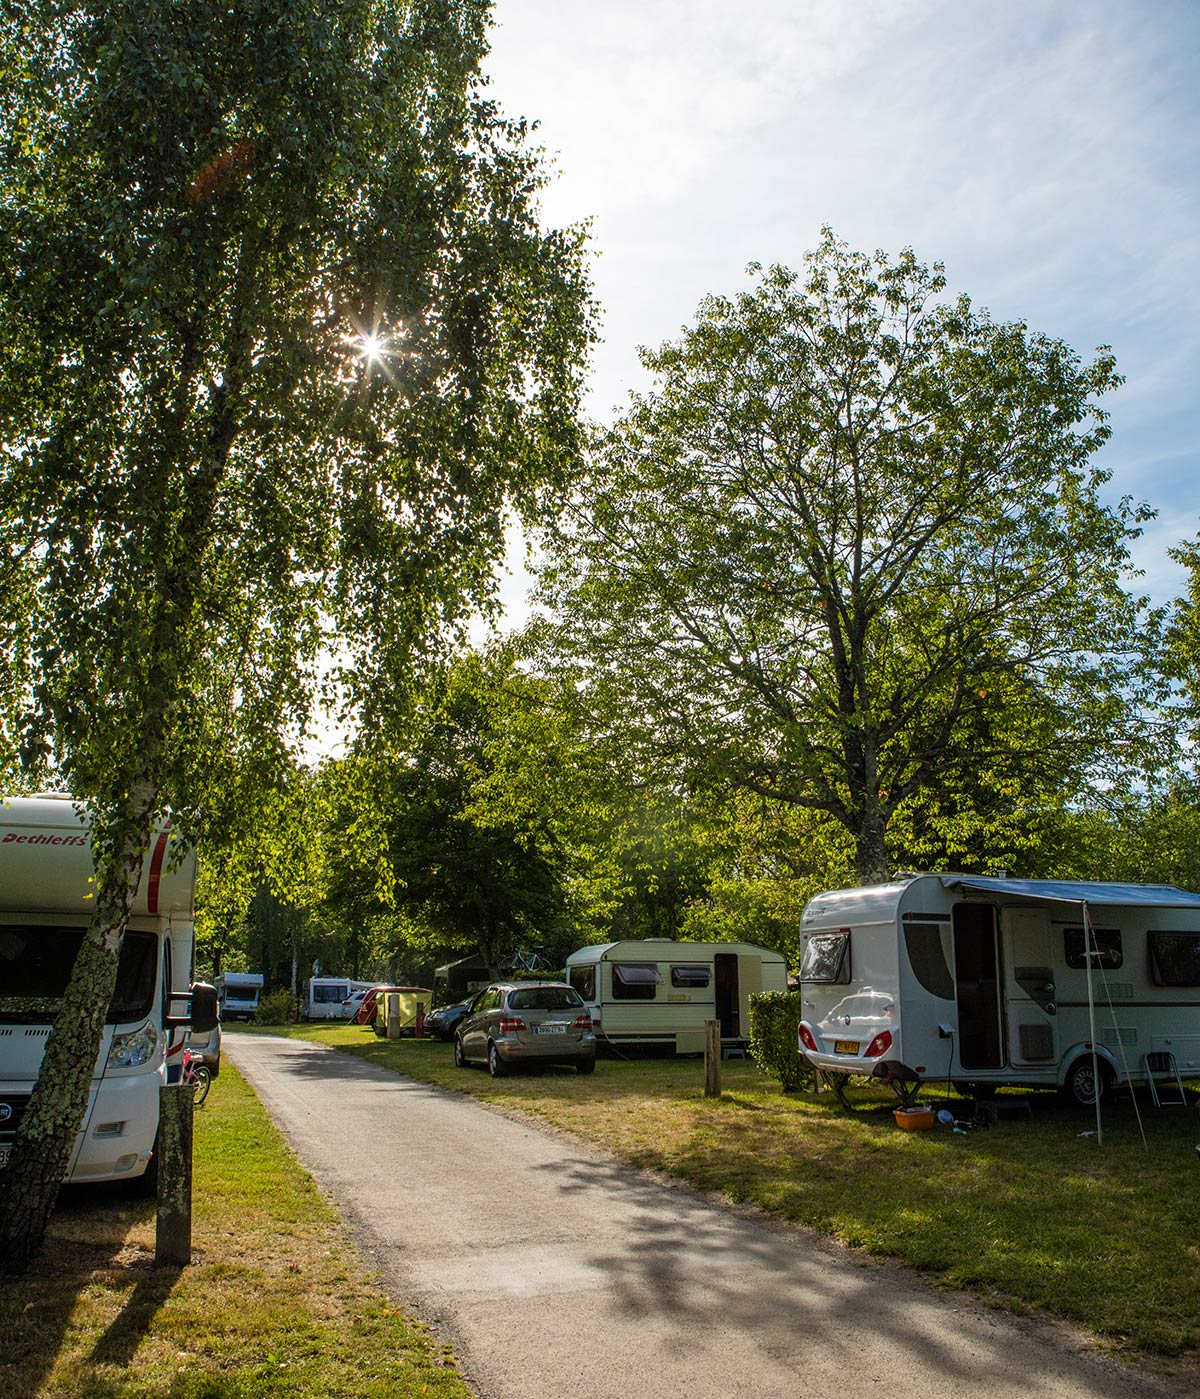 allée caravane camping Castel 5 étoiles en Vendée